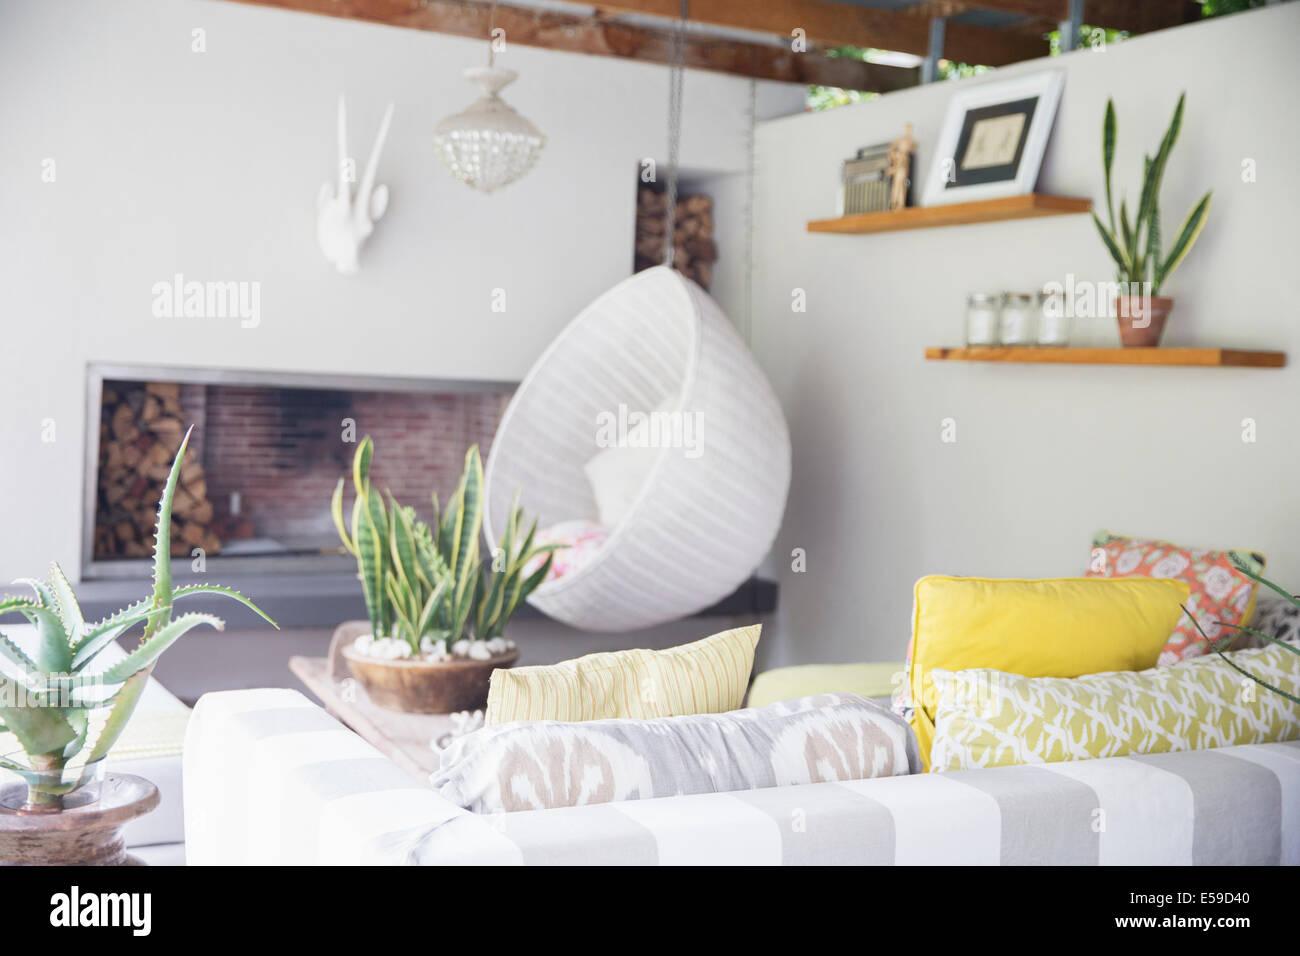 Sofá, silla y chimenea en salón moderno Imagen De Stock